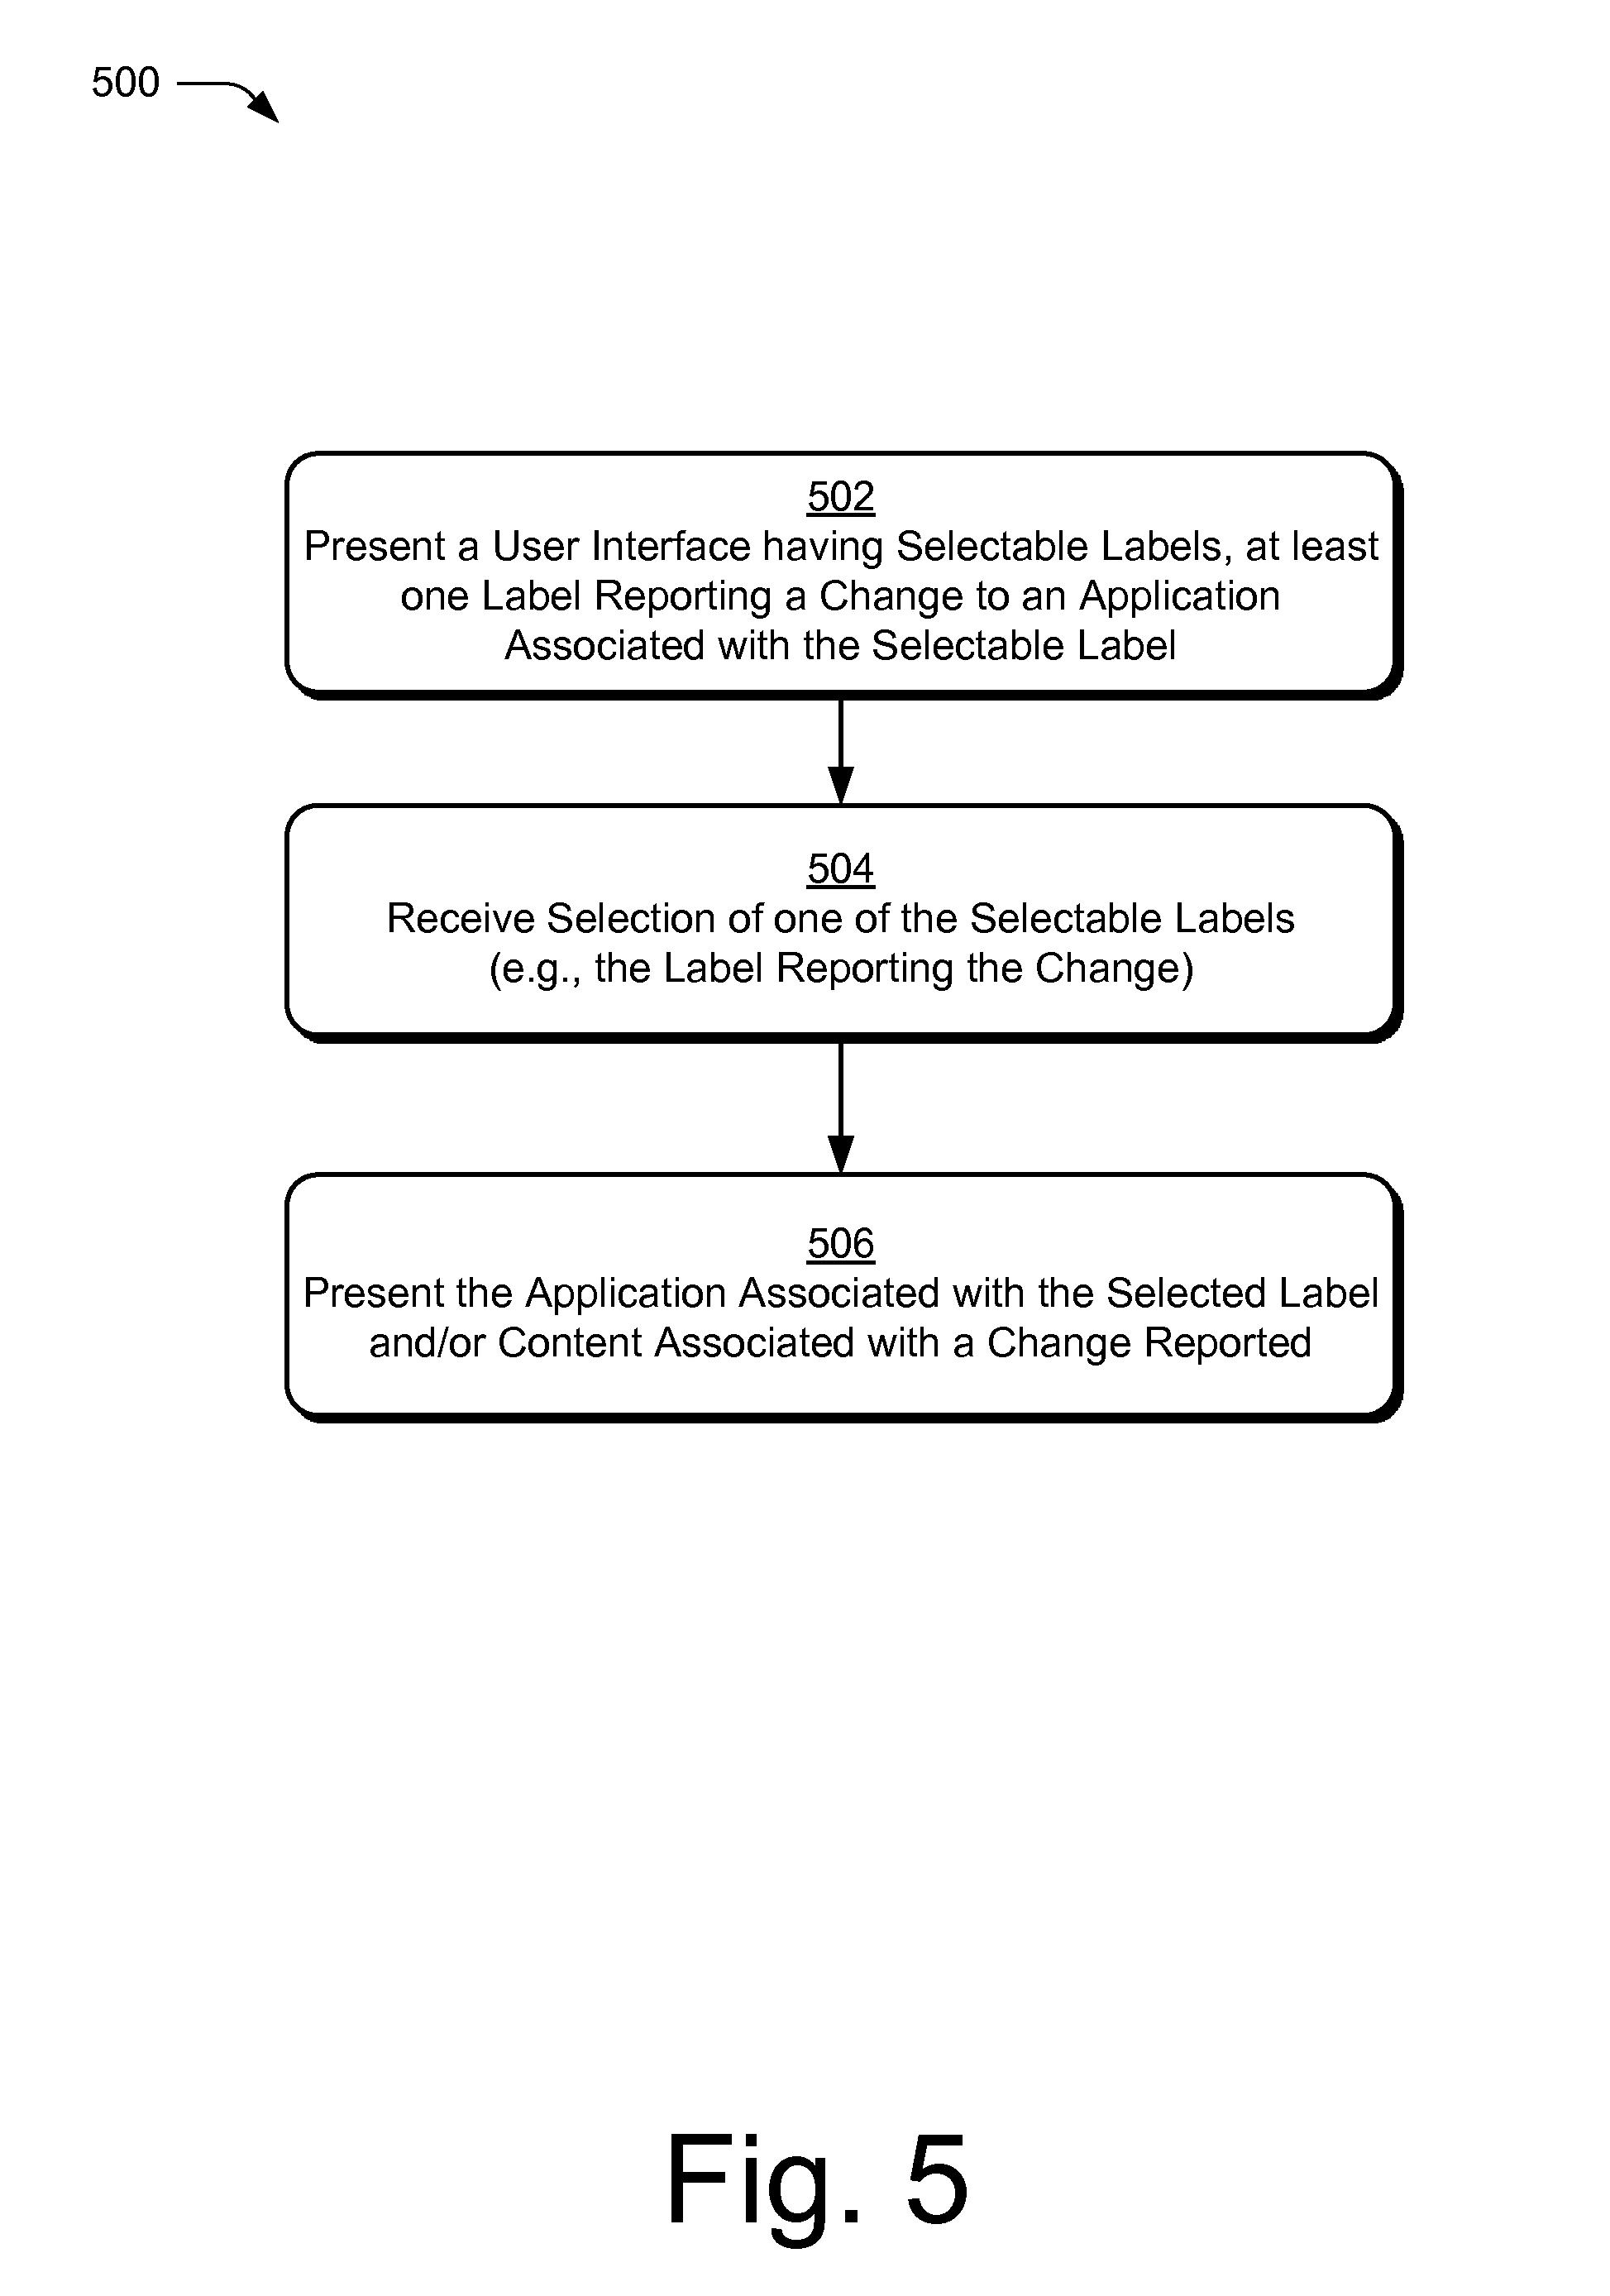 Patent US 9,766,790 B2